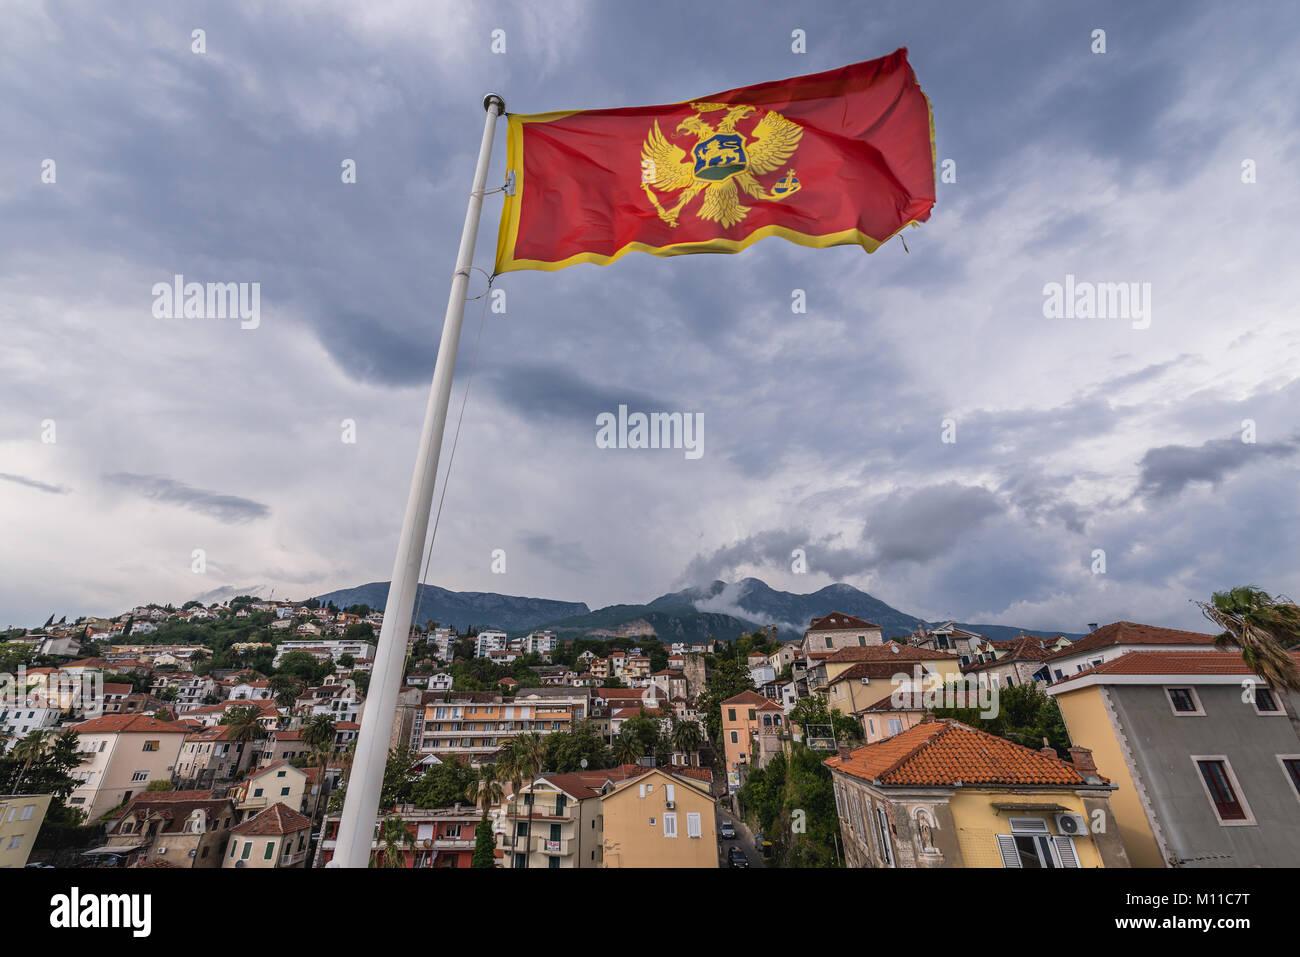 Montenegrin flag on Forte Mare fortress in Herceg Novi city on the Adriatic Sea coast in Montenegro Stock Photo